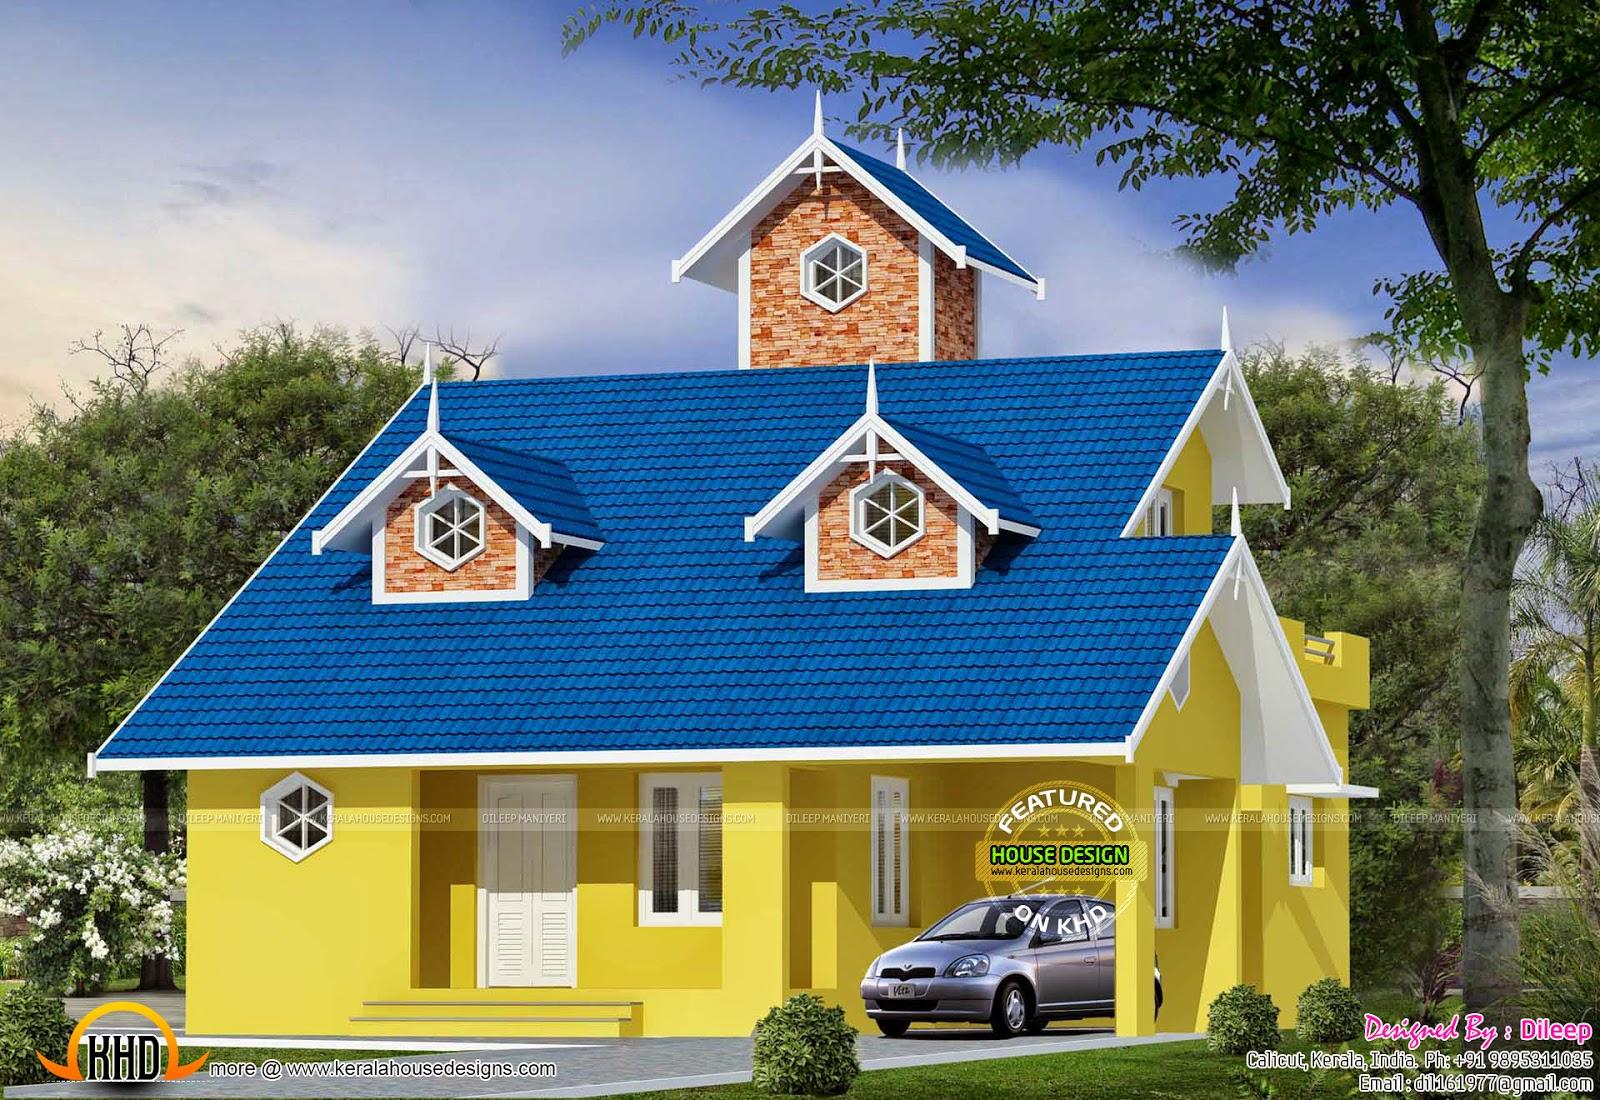 victorian house plan kerala home design floor plans victorian style home exterior trim victorian home exterior design